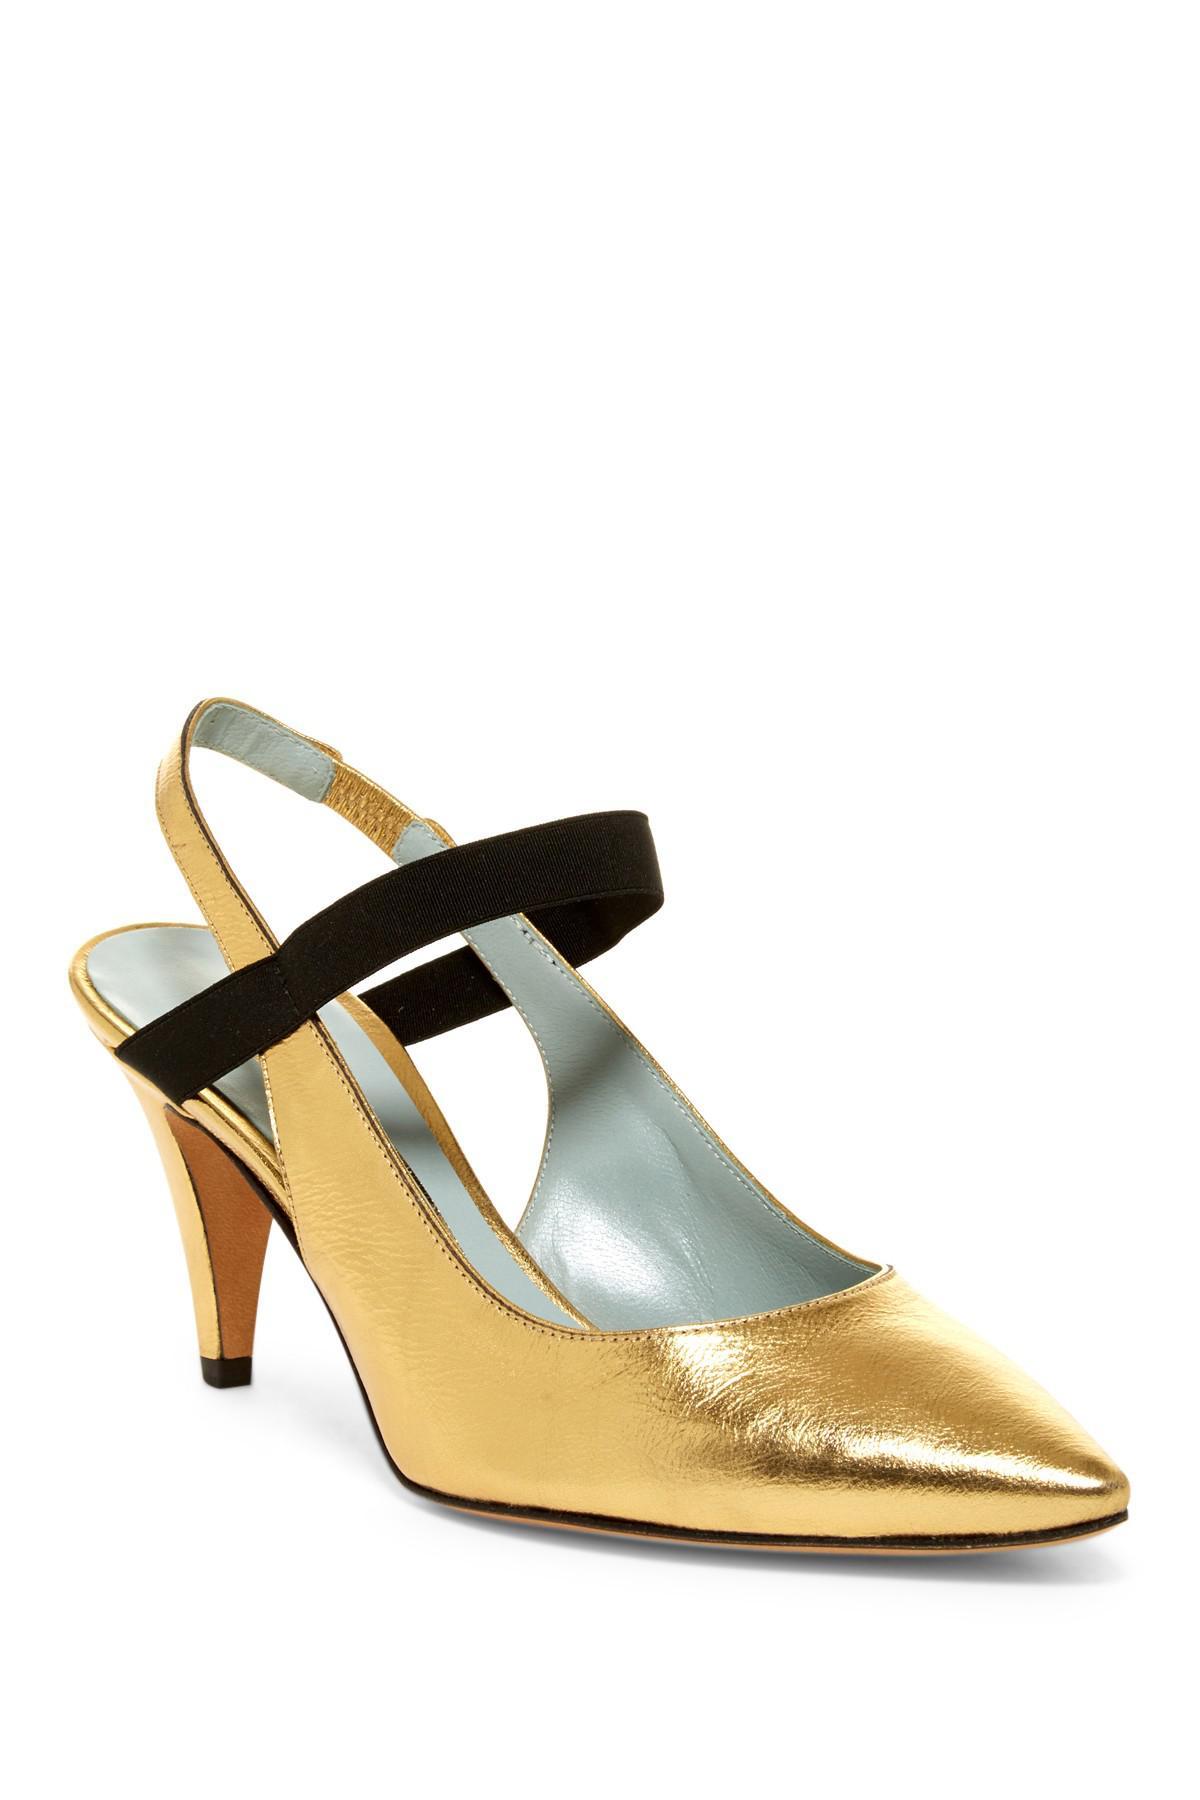 Marc Jacobs VALERY women's Court Shoes in Limit Discount Clean And Classic Authentic For Sale Deals iO0fQPJI